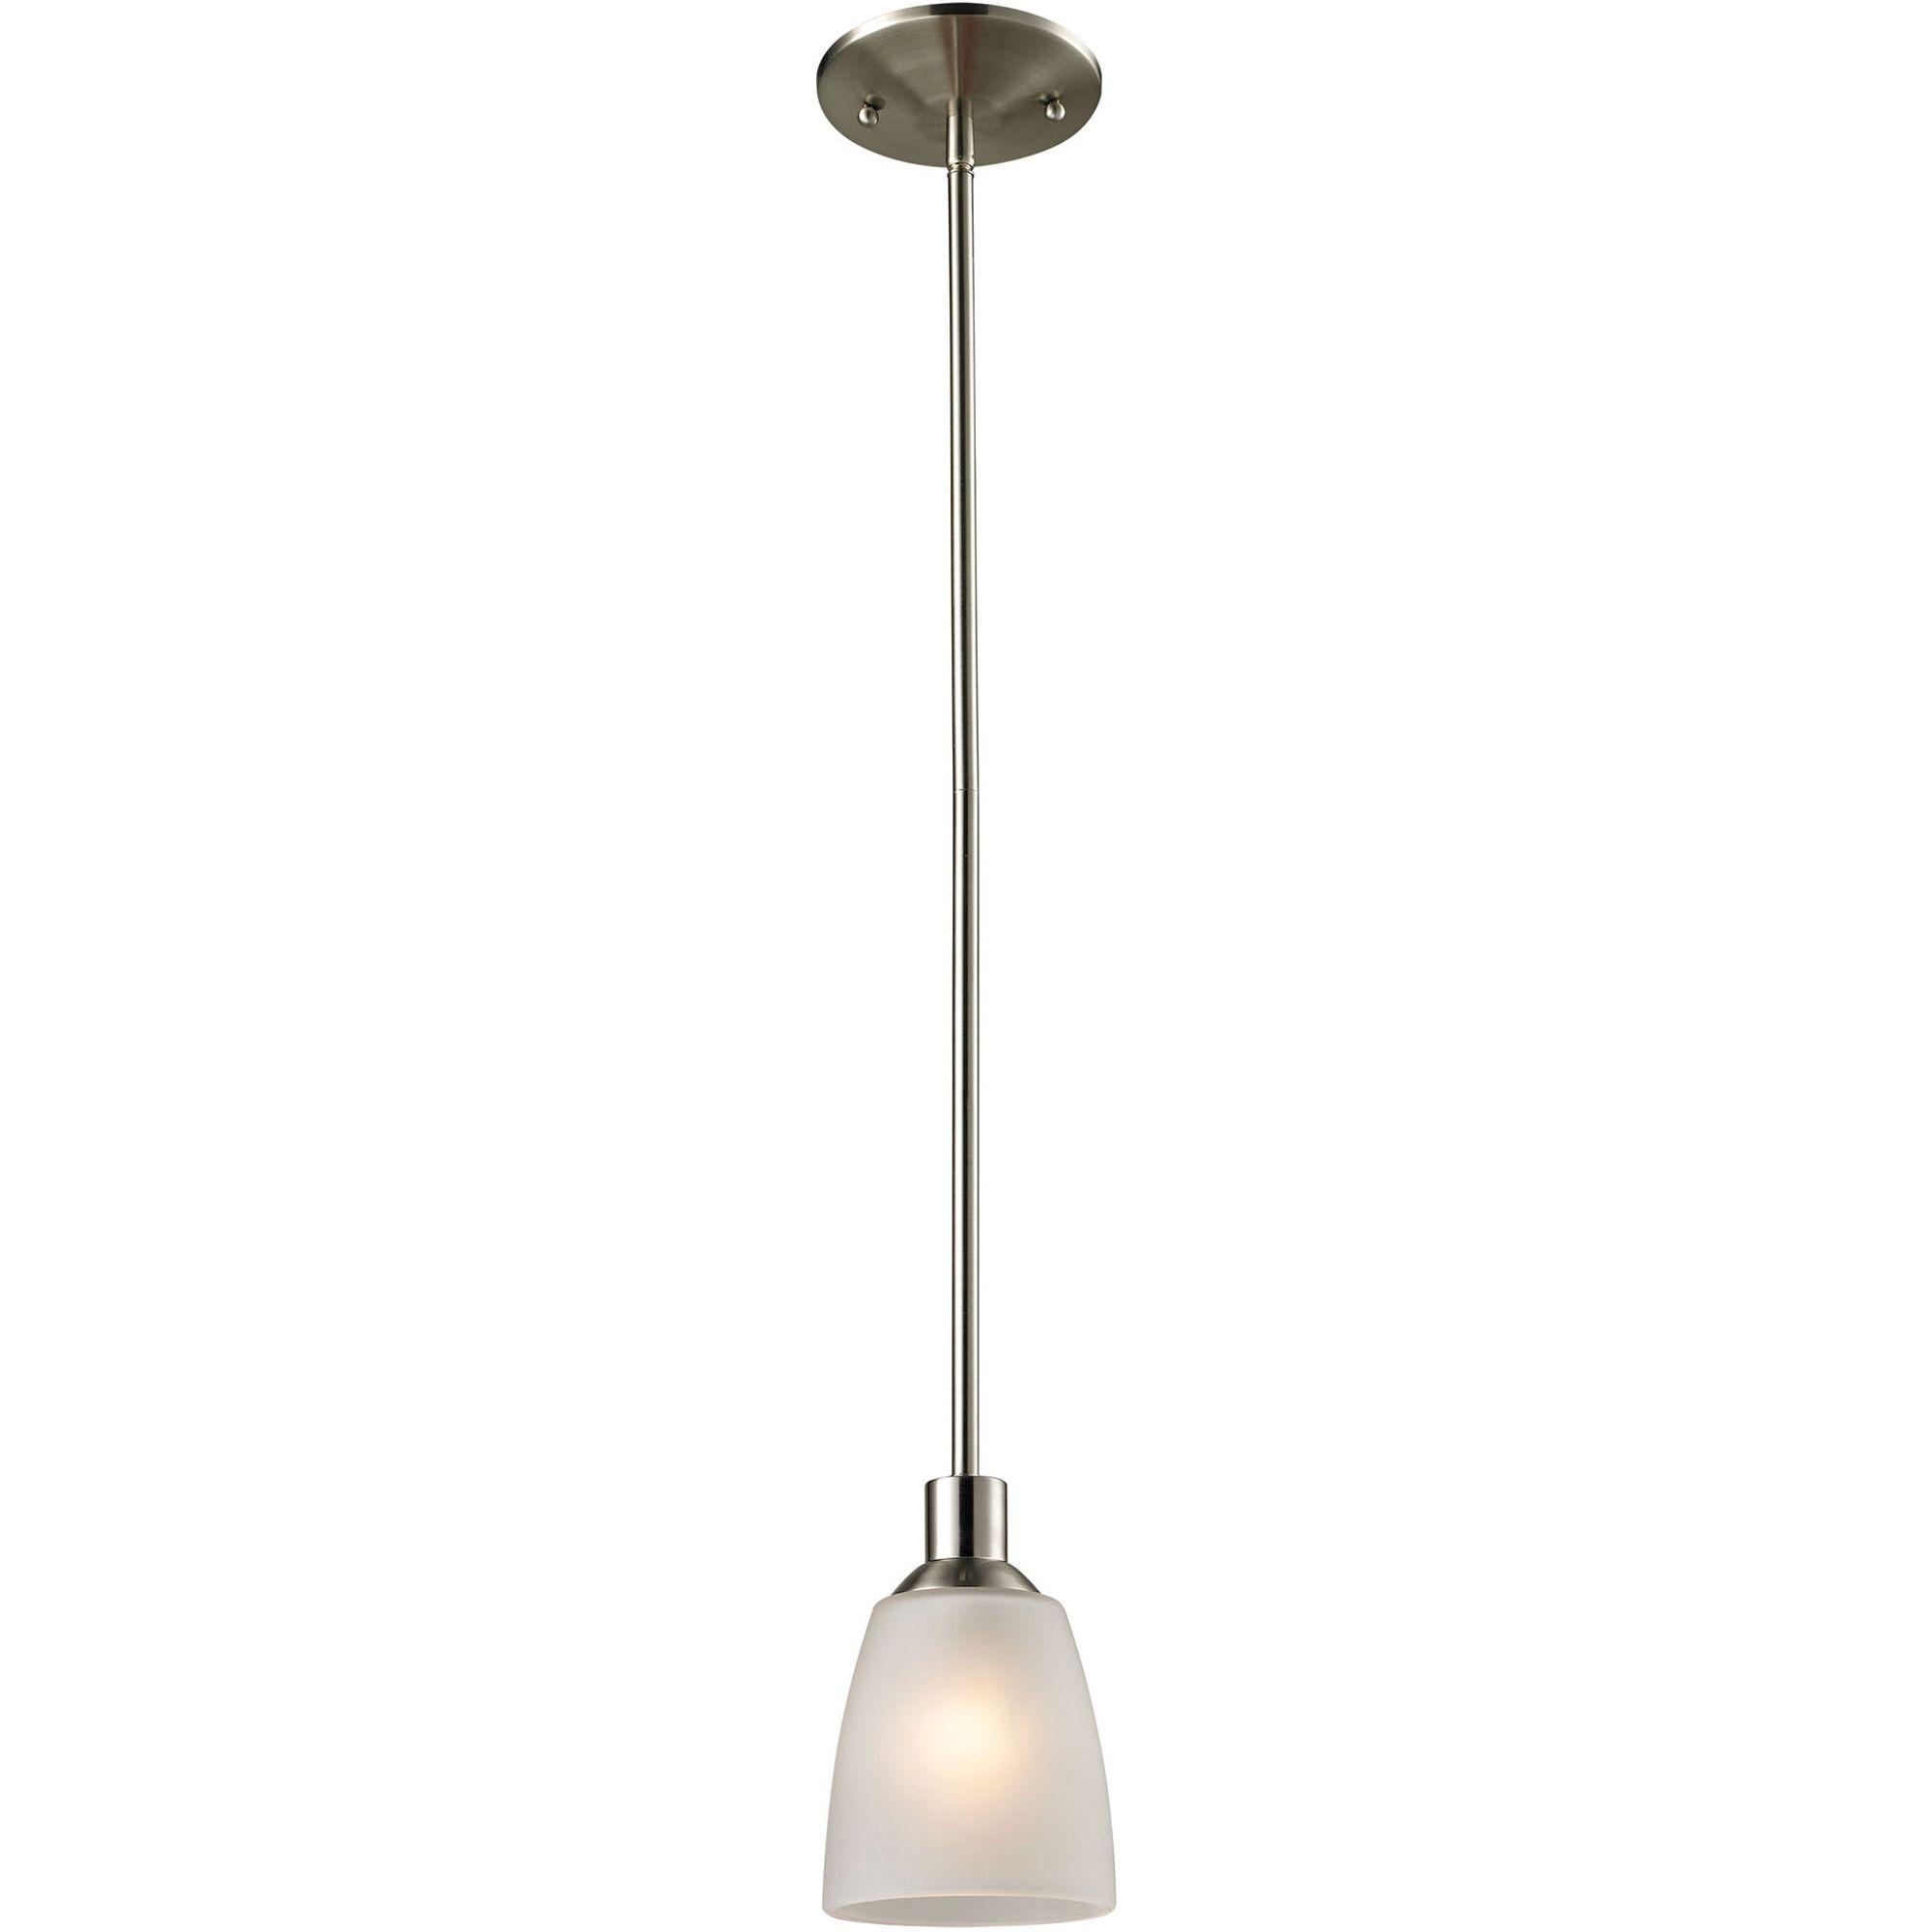 Jackson 1 Light Mini Pendant In Brushed Nickel | Cornerstone Lighting |  Home Gallery Stores